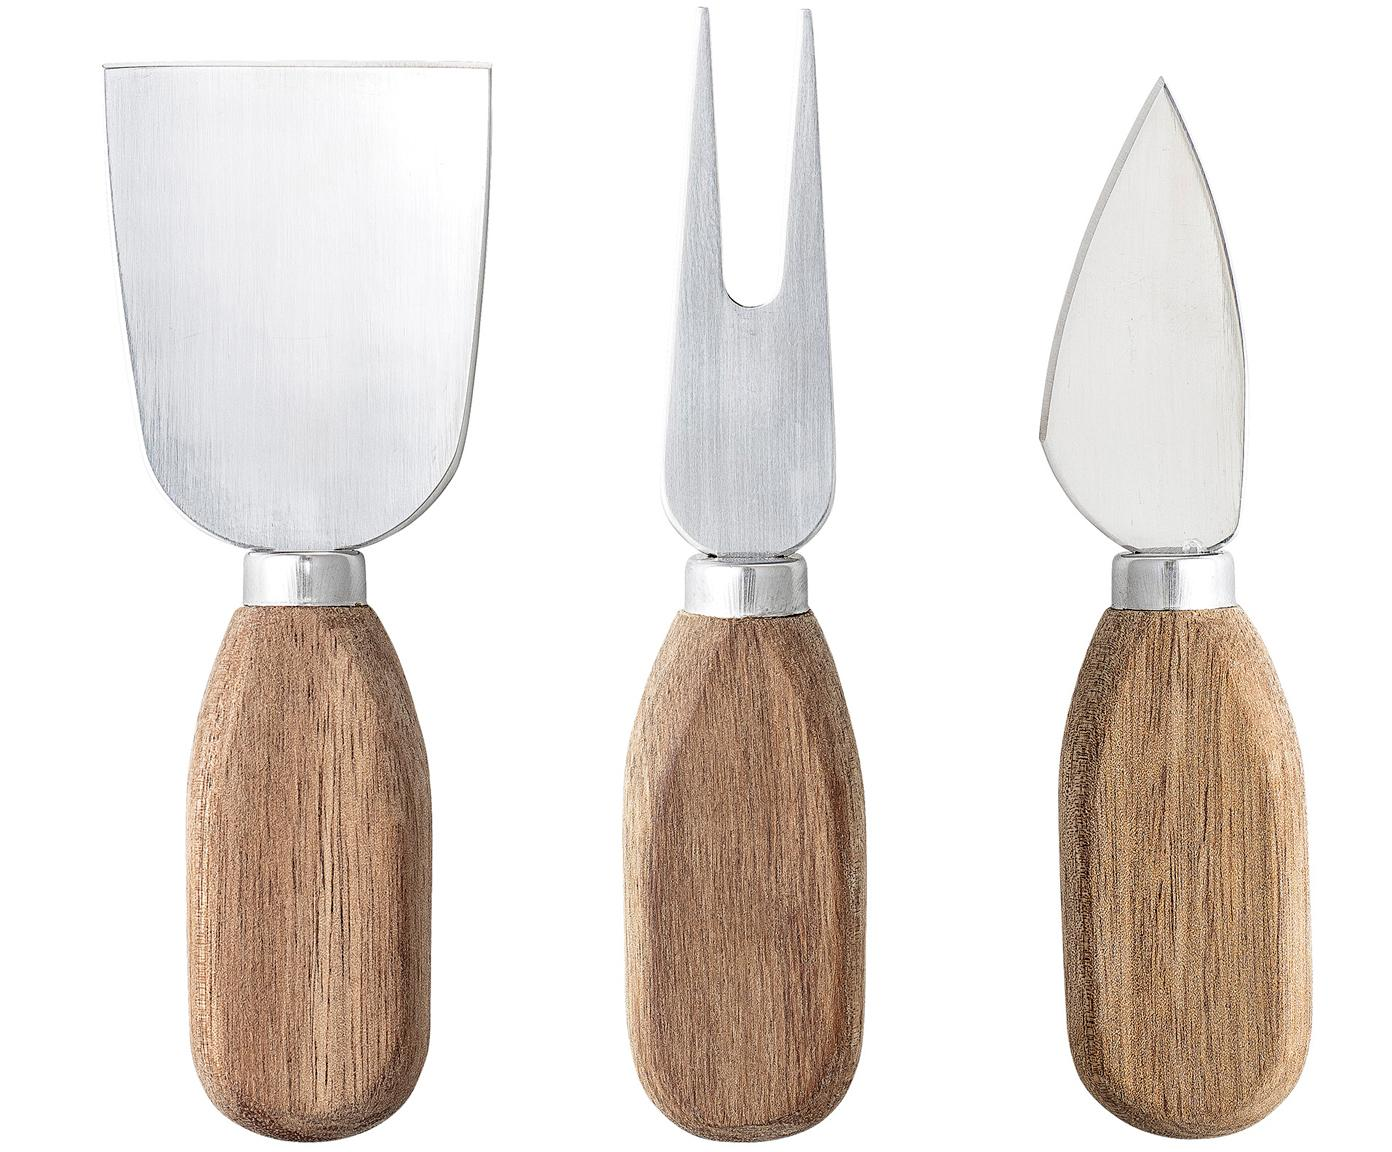 Set de cuchillos de queso Chase, 3pzas., Acero, madera de acacia, Tamaños diferentes